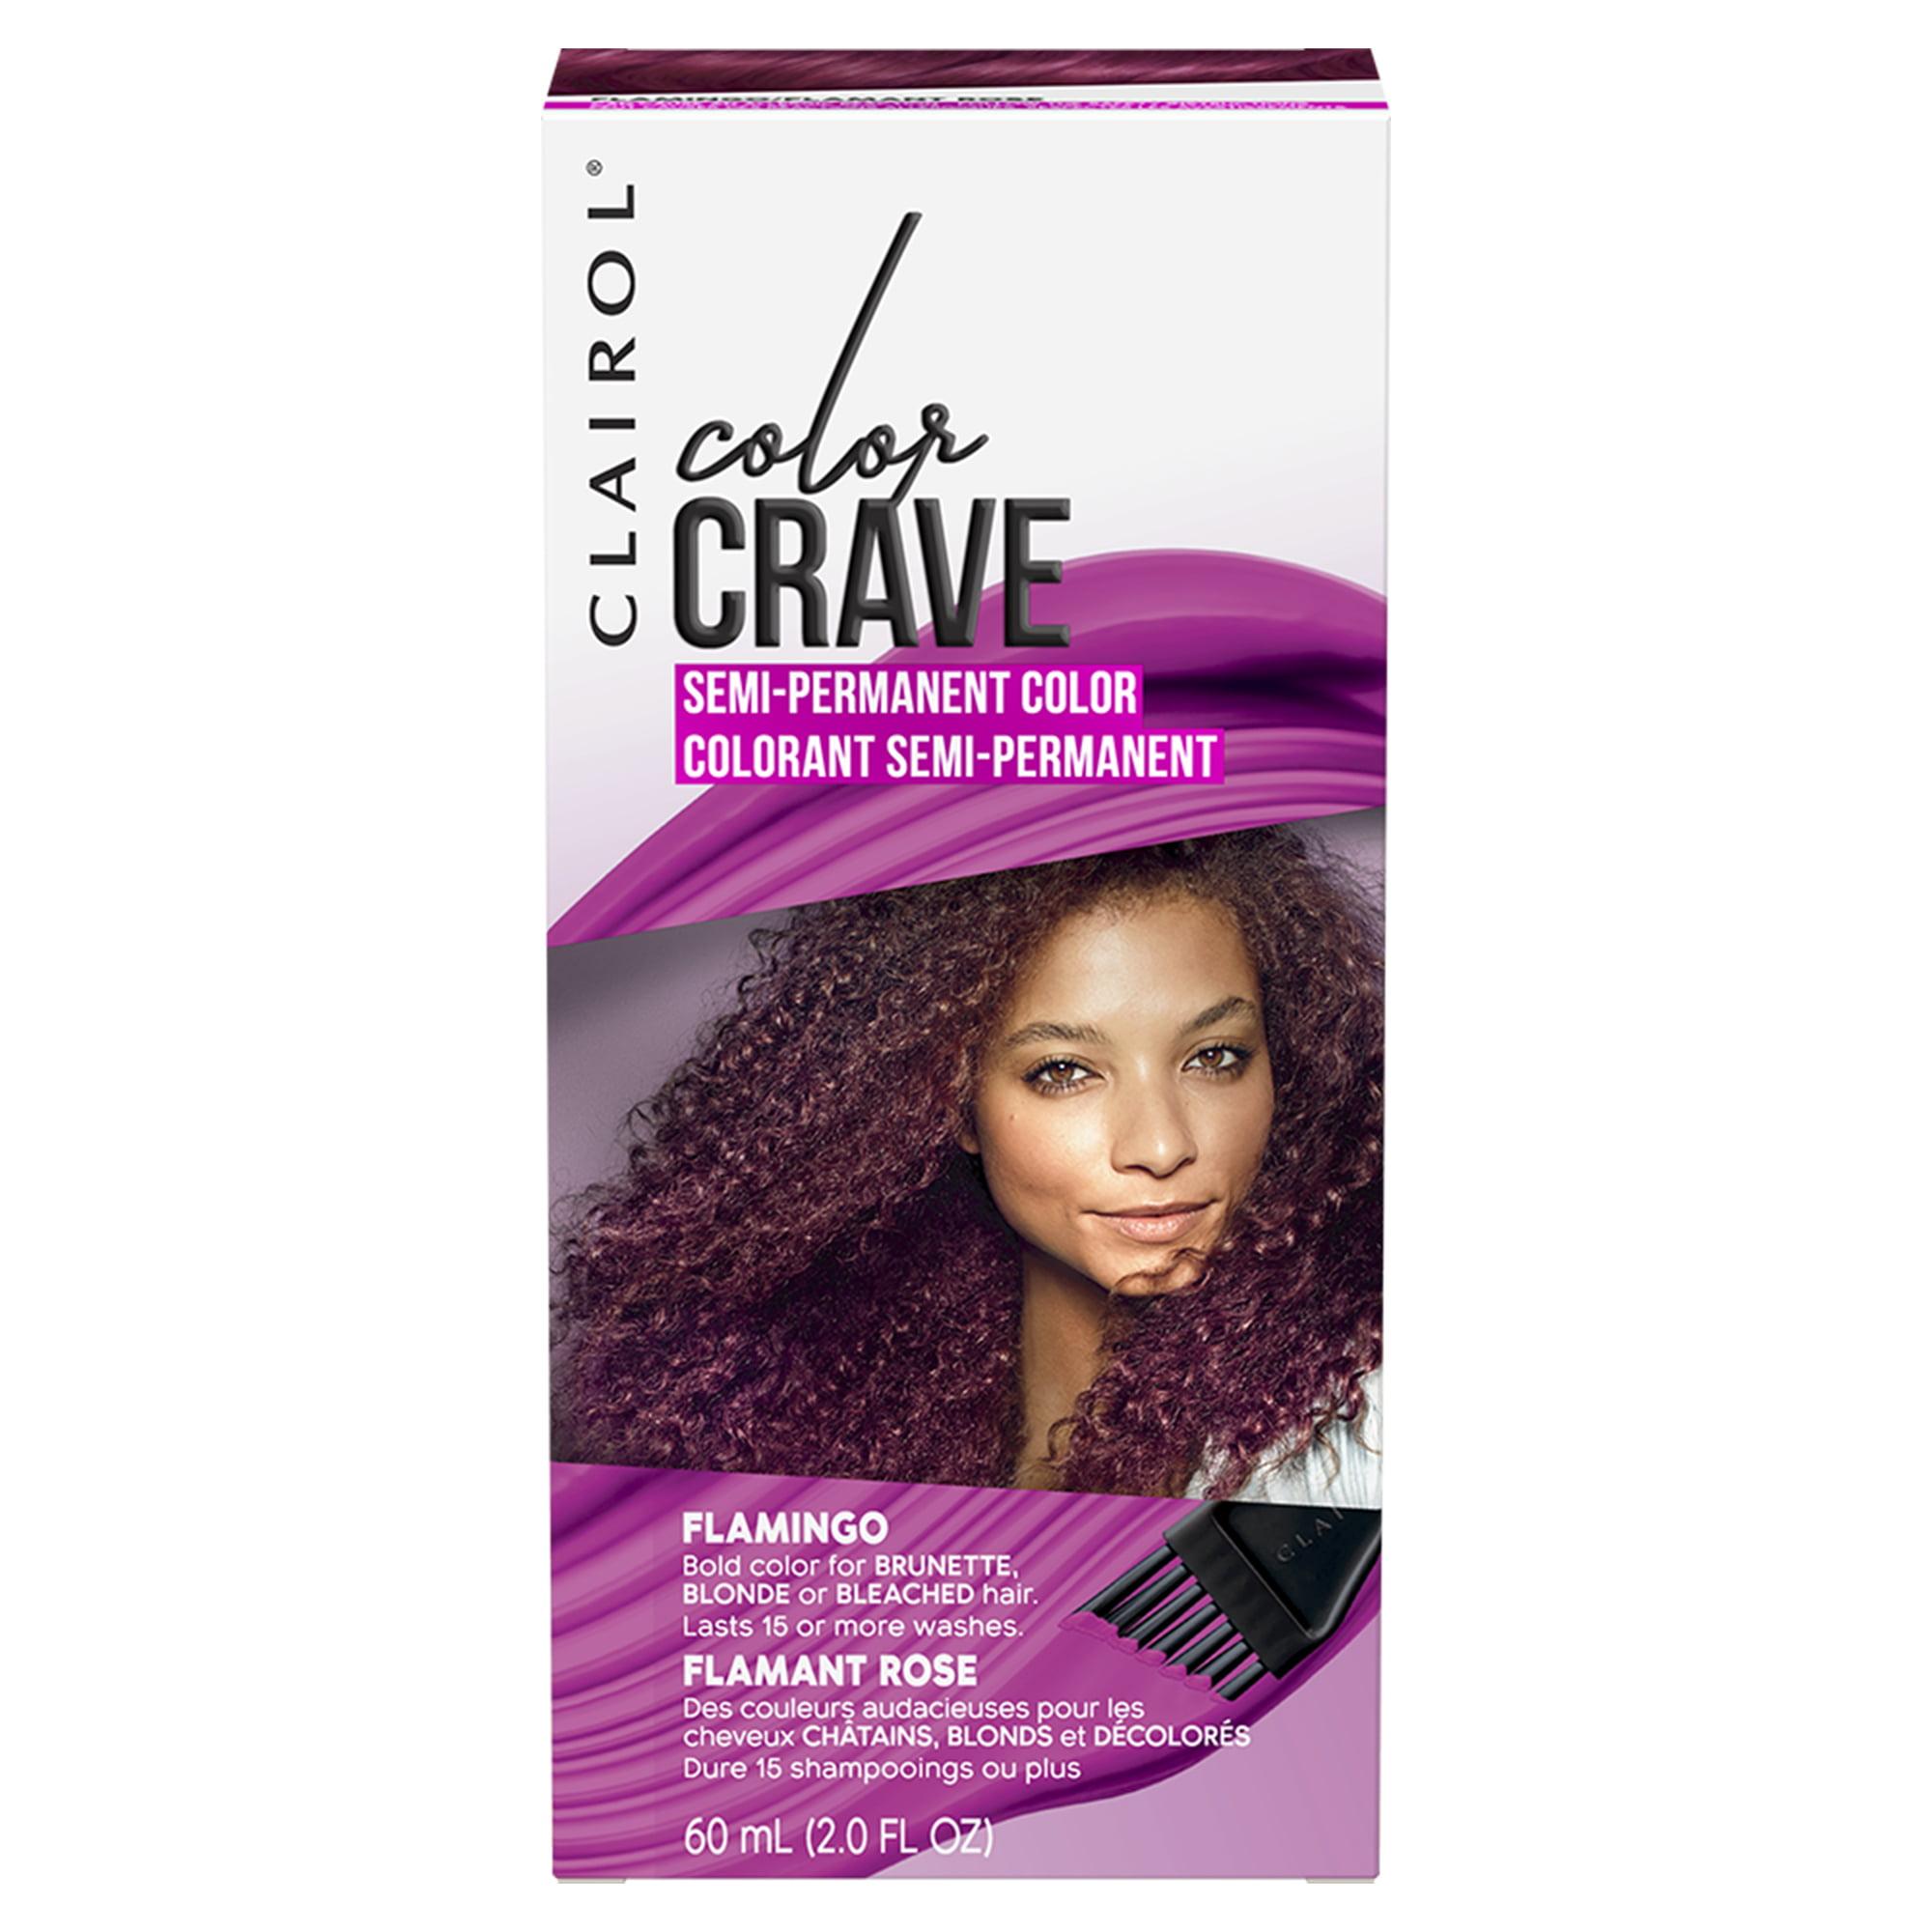 Clairol Color Crave Semi-Permanent Hair Color, Flamingo